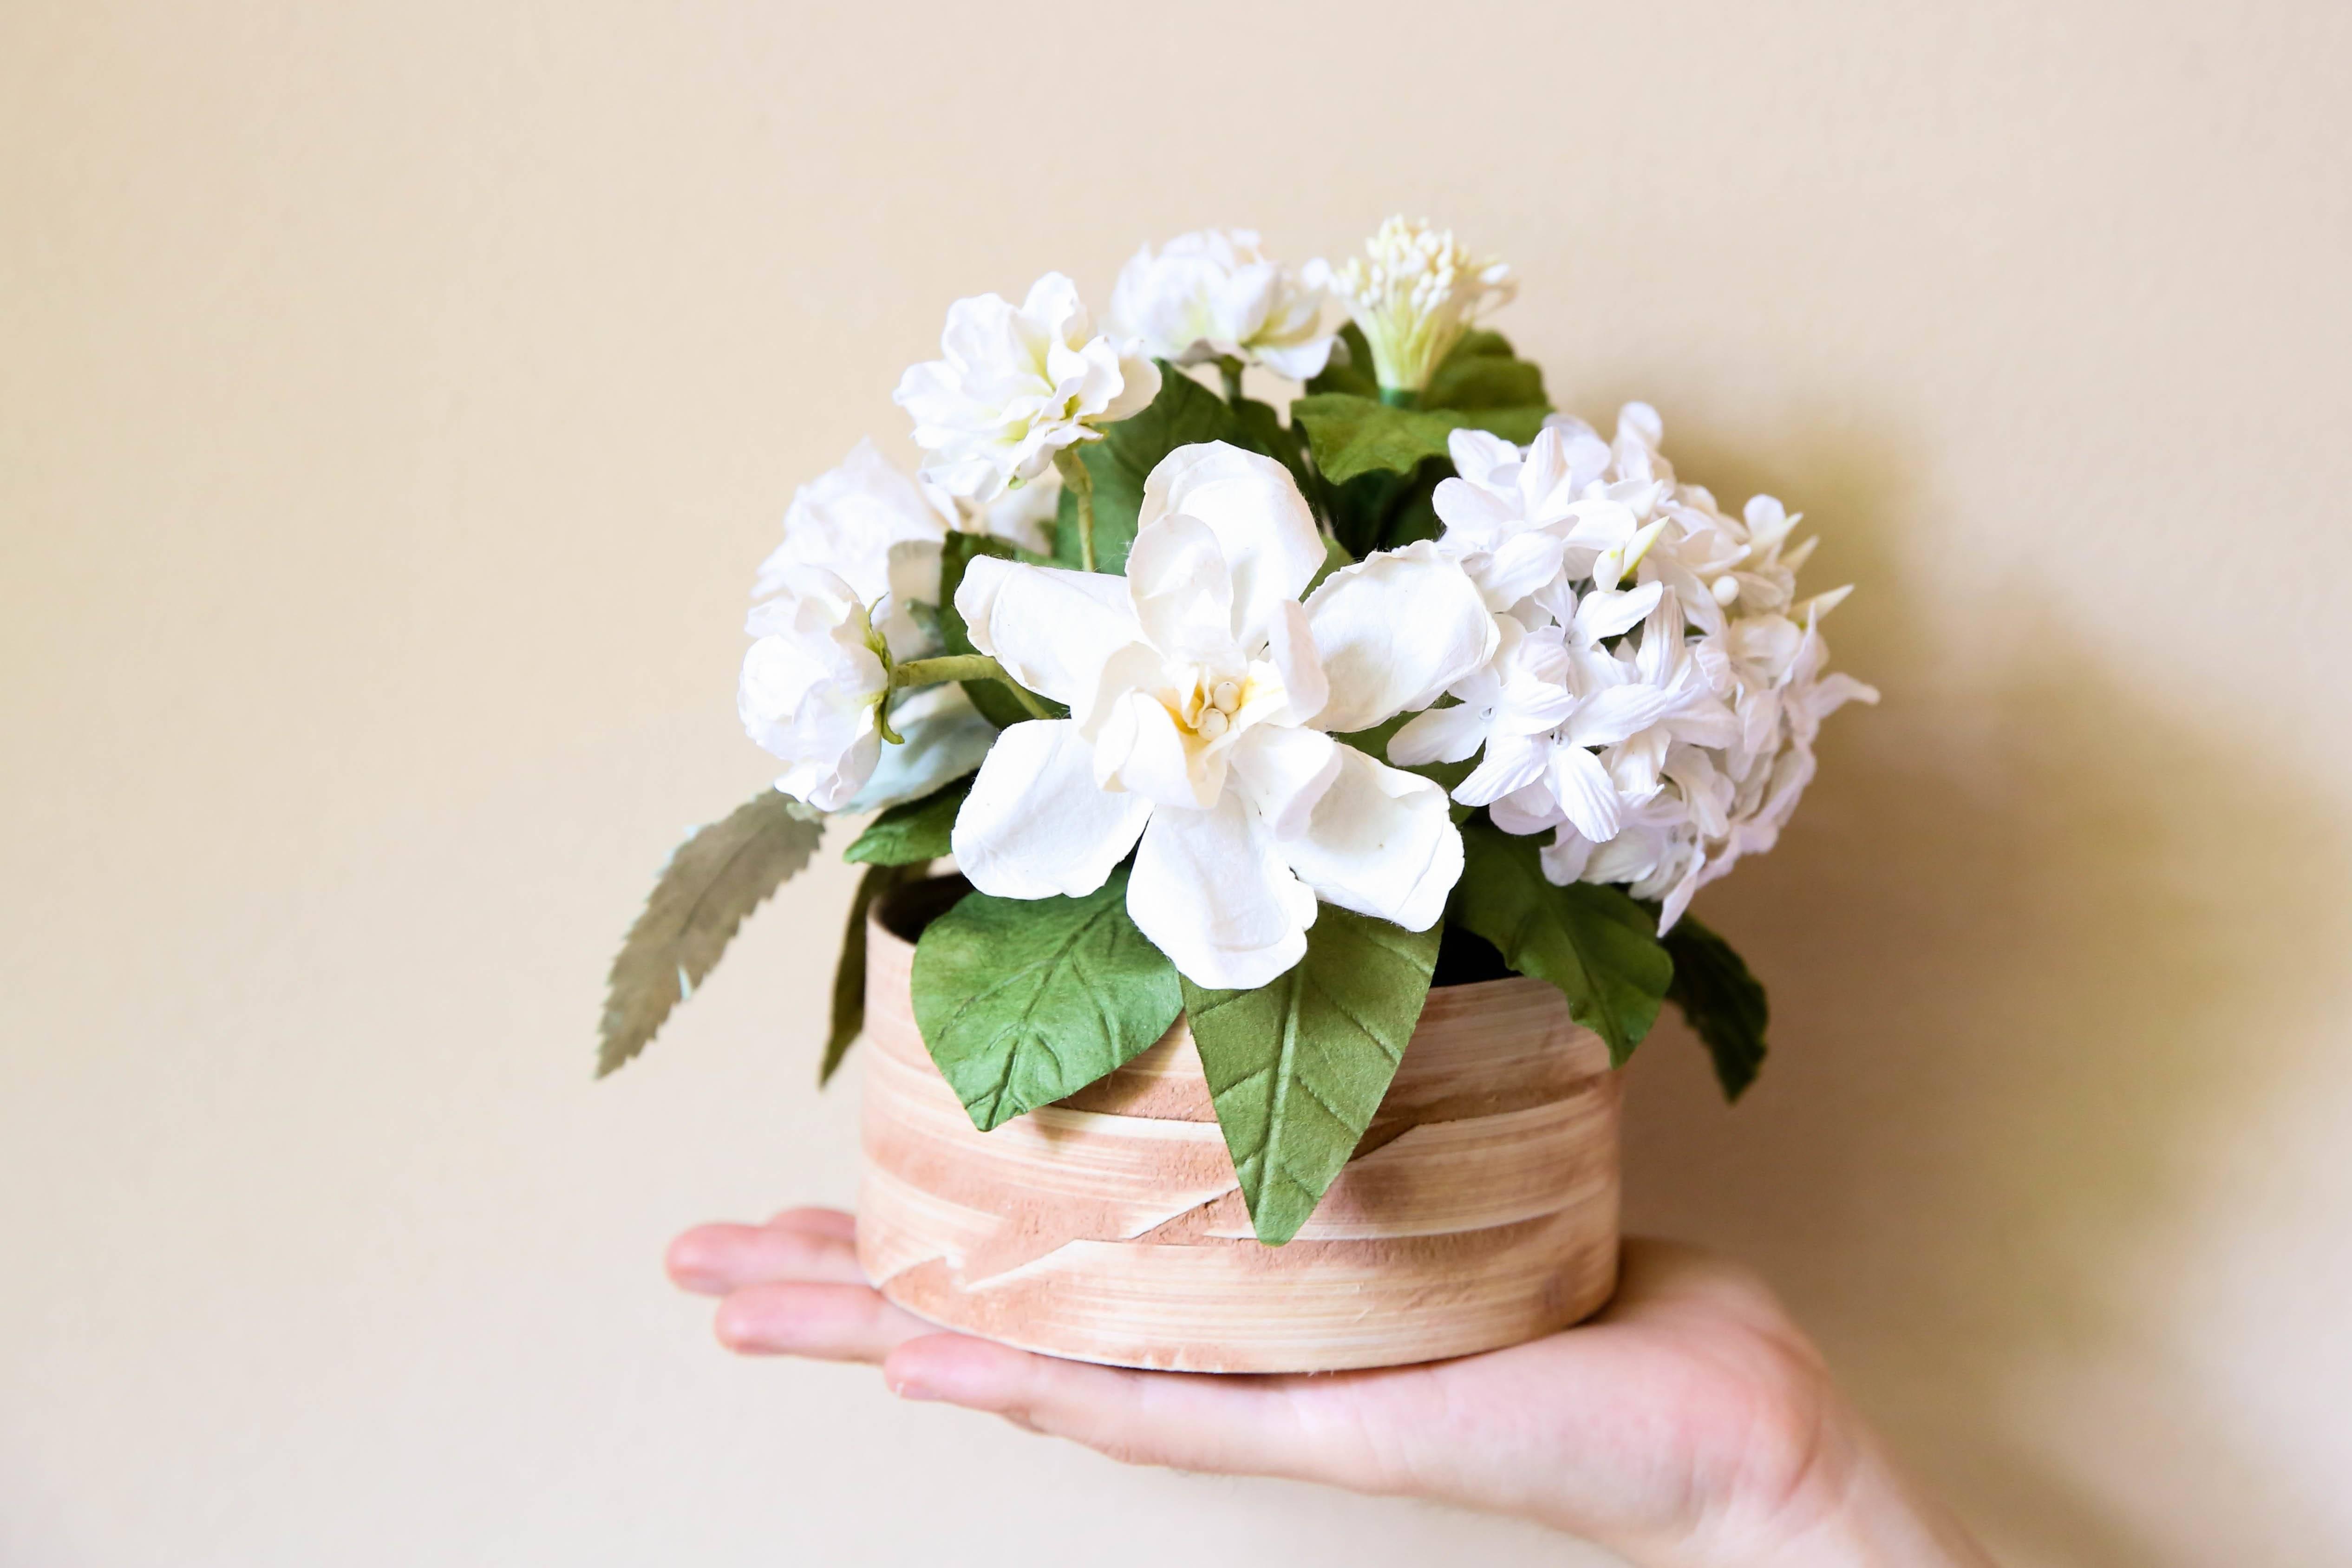 Flowers crafts with children